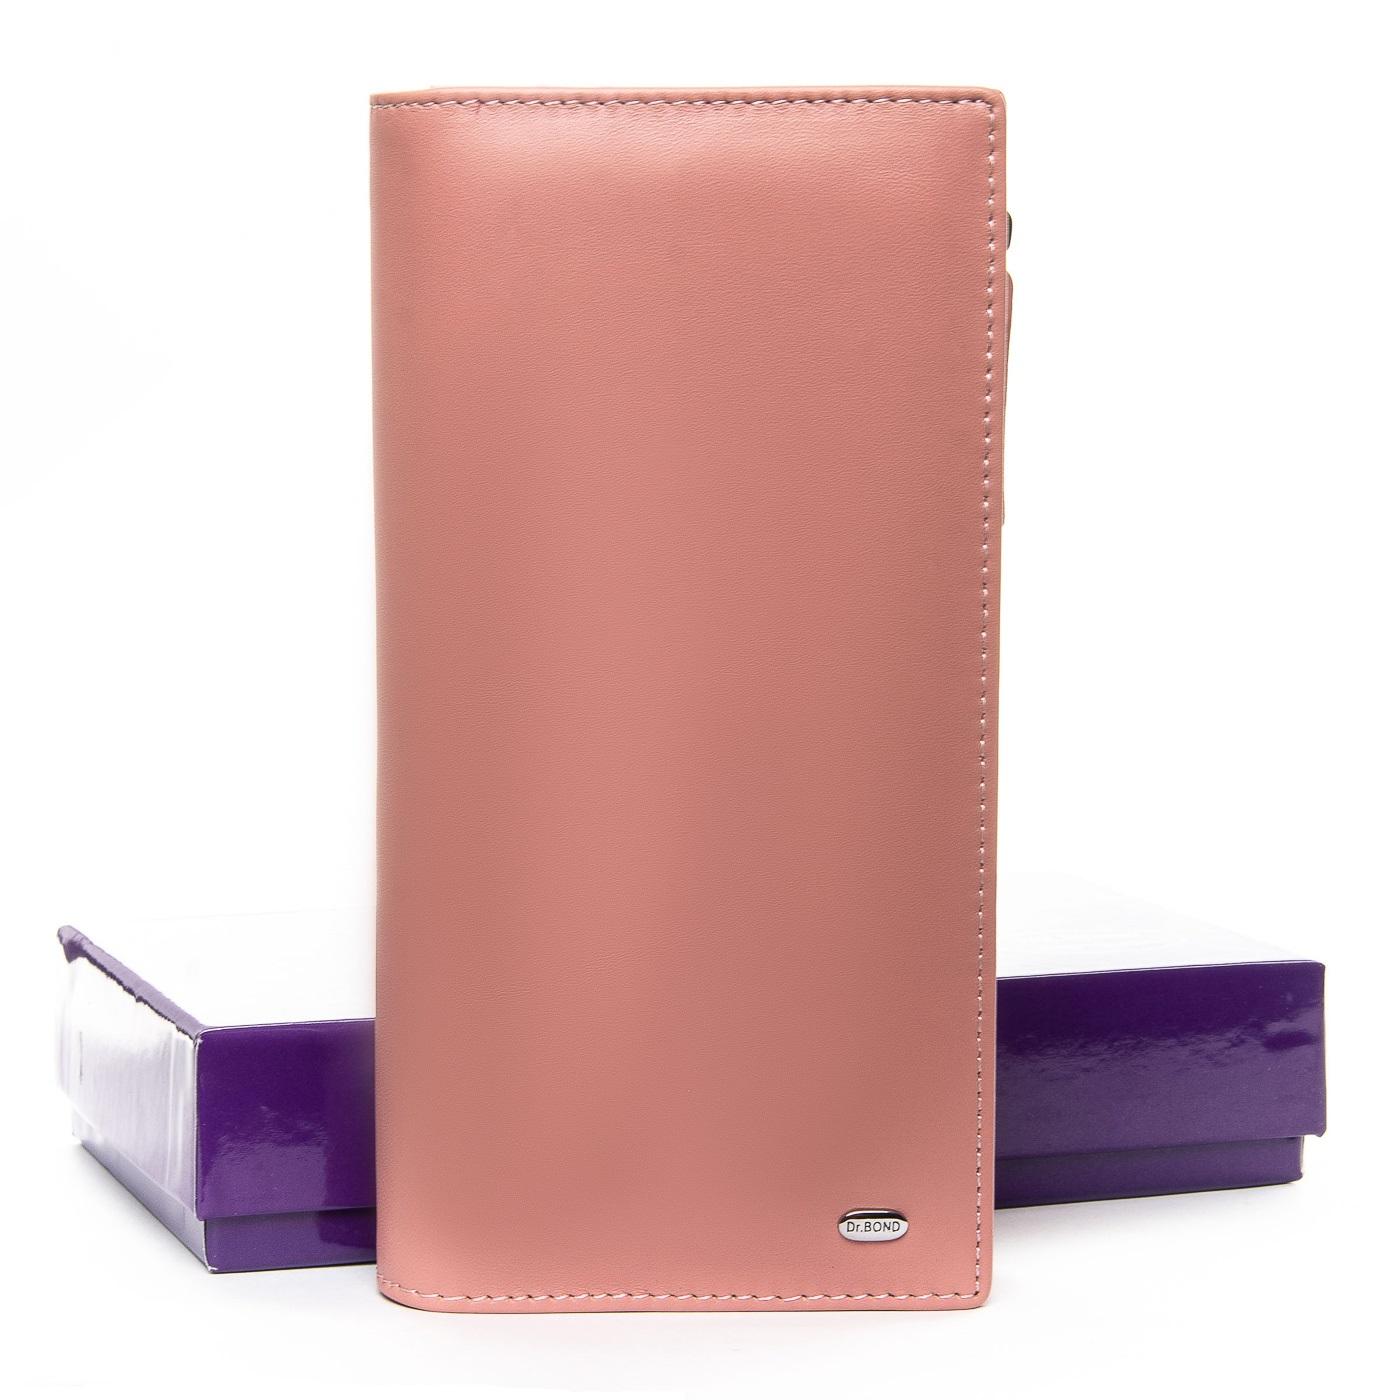 Кошелек Classic кожа DR. BOND WMB-3M pink